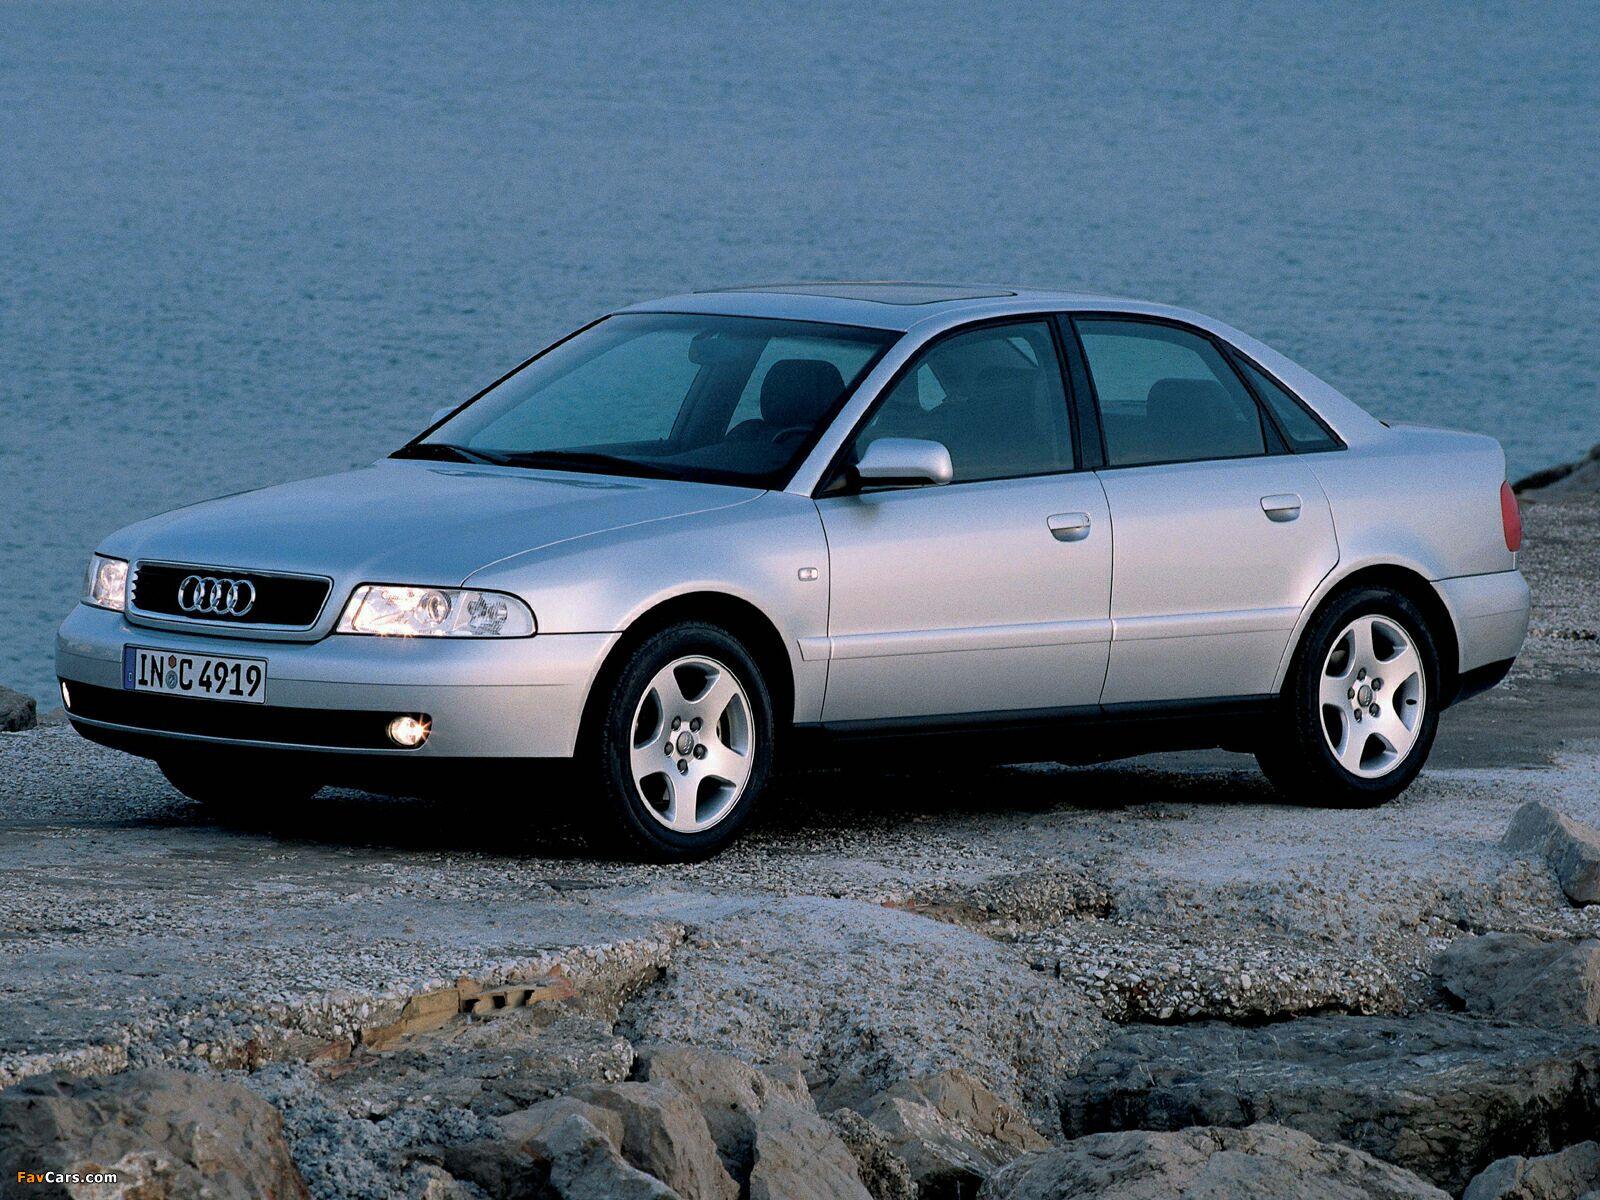 Audi A4 1.8 TDI Sedan B5,8D (1997-2000) images (1600x1200)